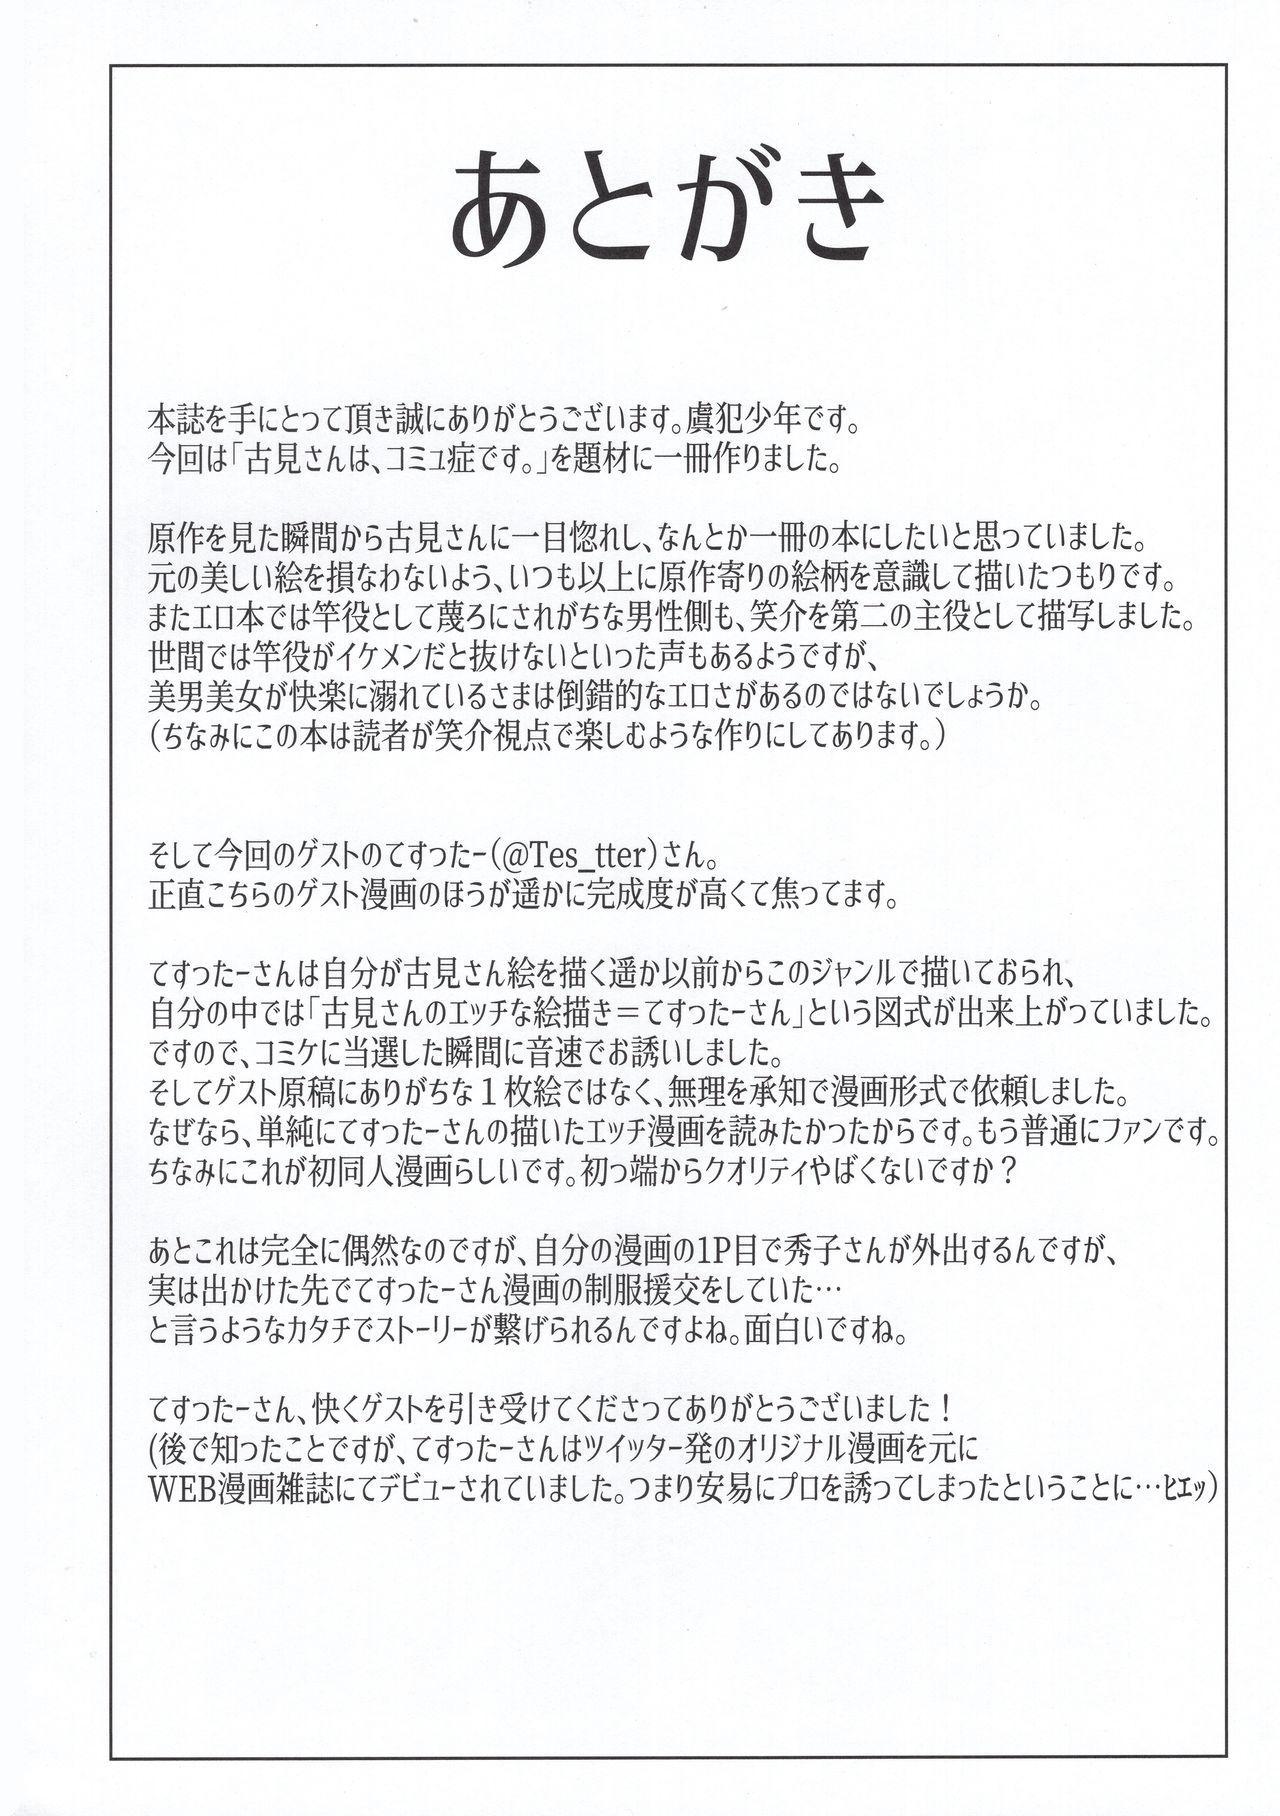 Komi-ke no Kyoudai Asobi 30